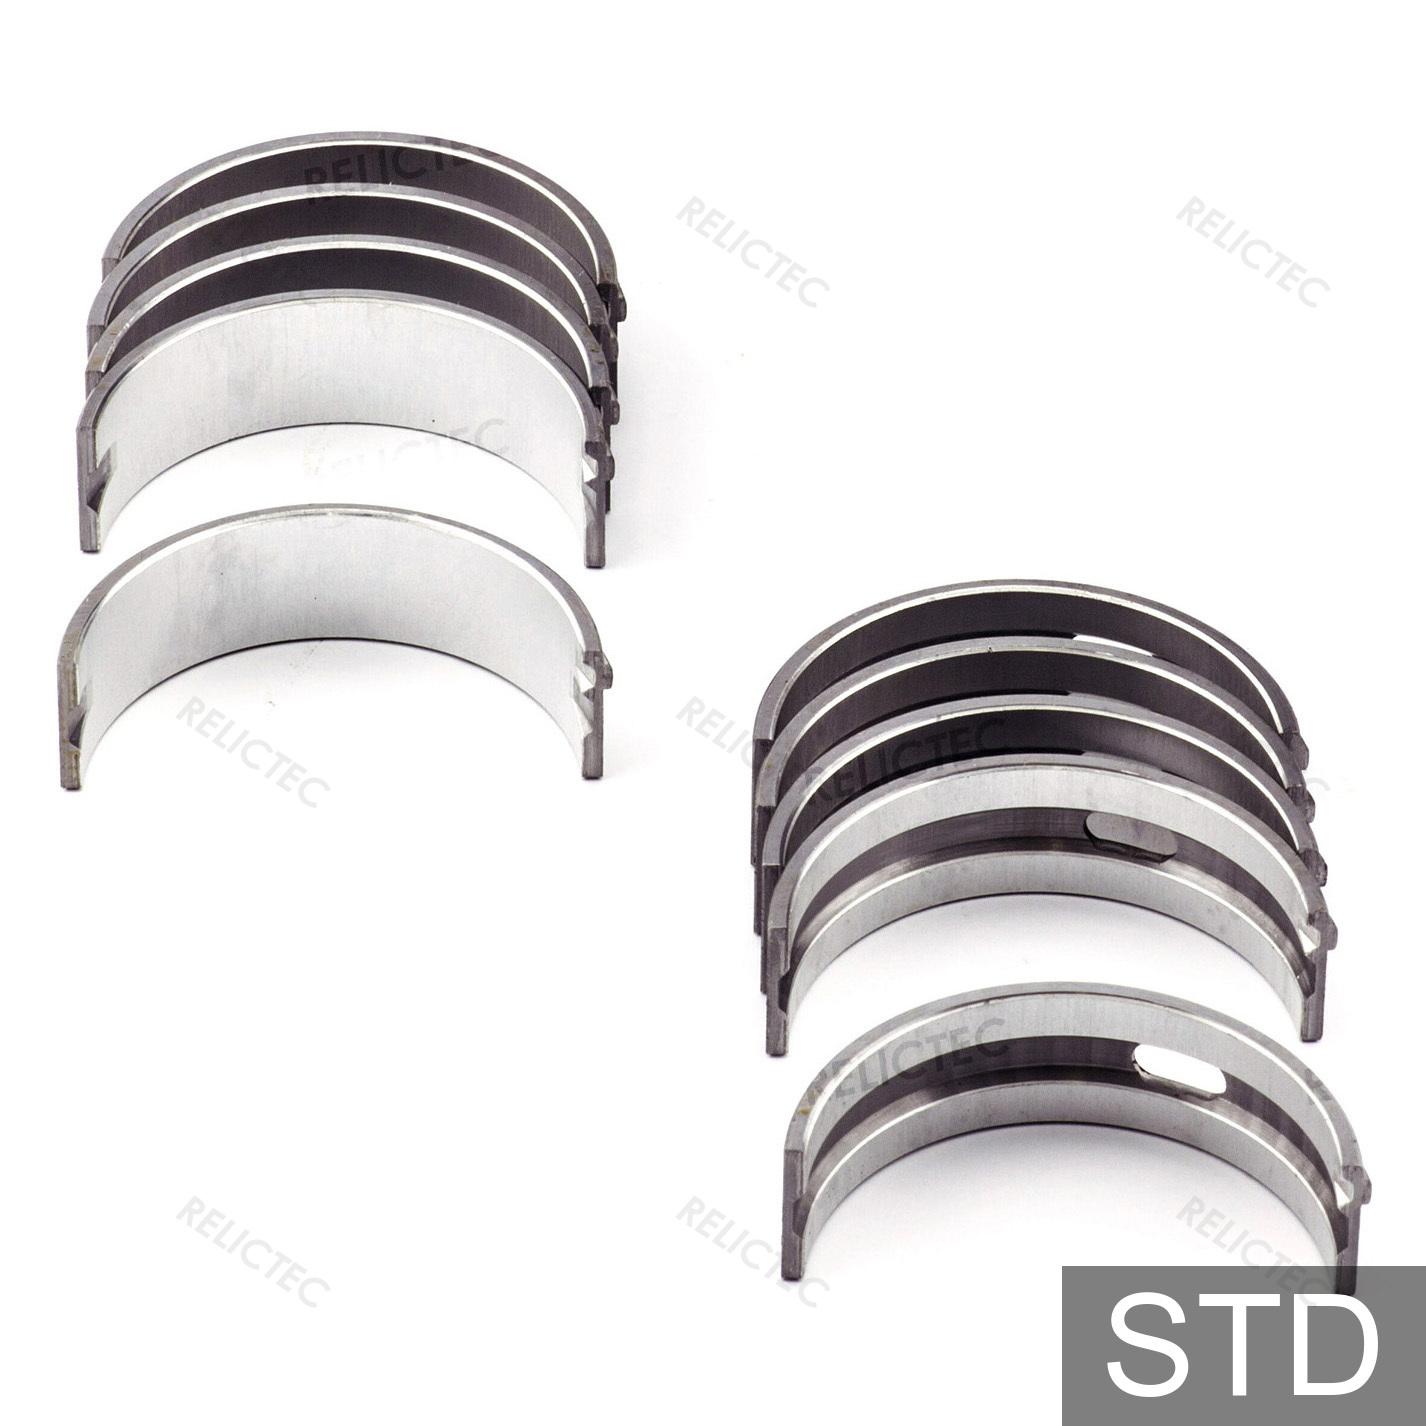 For Audi VW Engine Crankshaft Main Bearing Set Standard Glyco 026 198 491